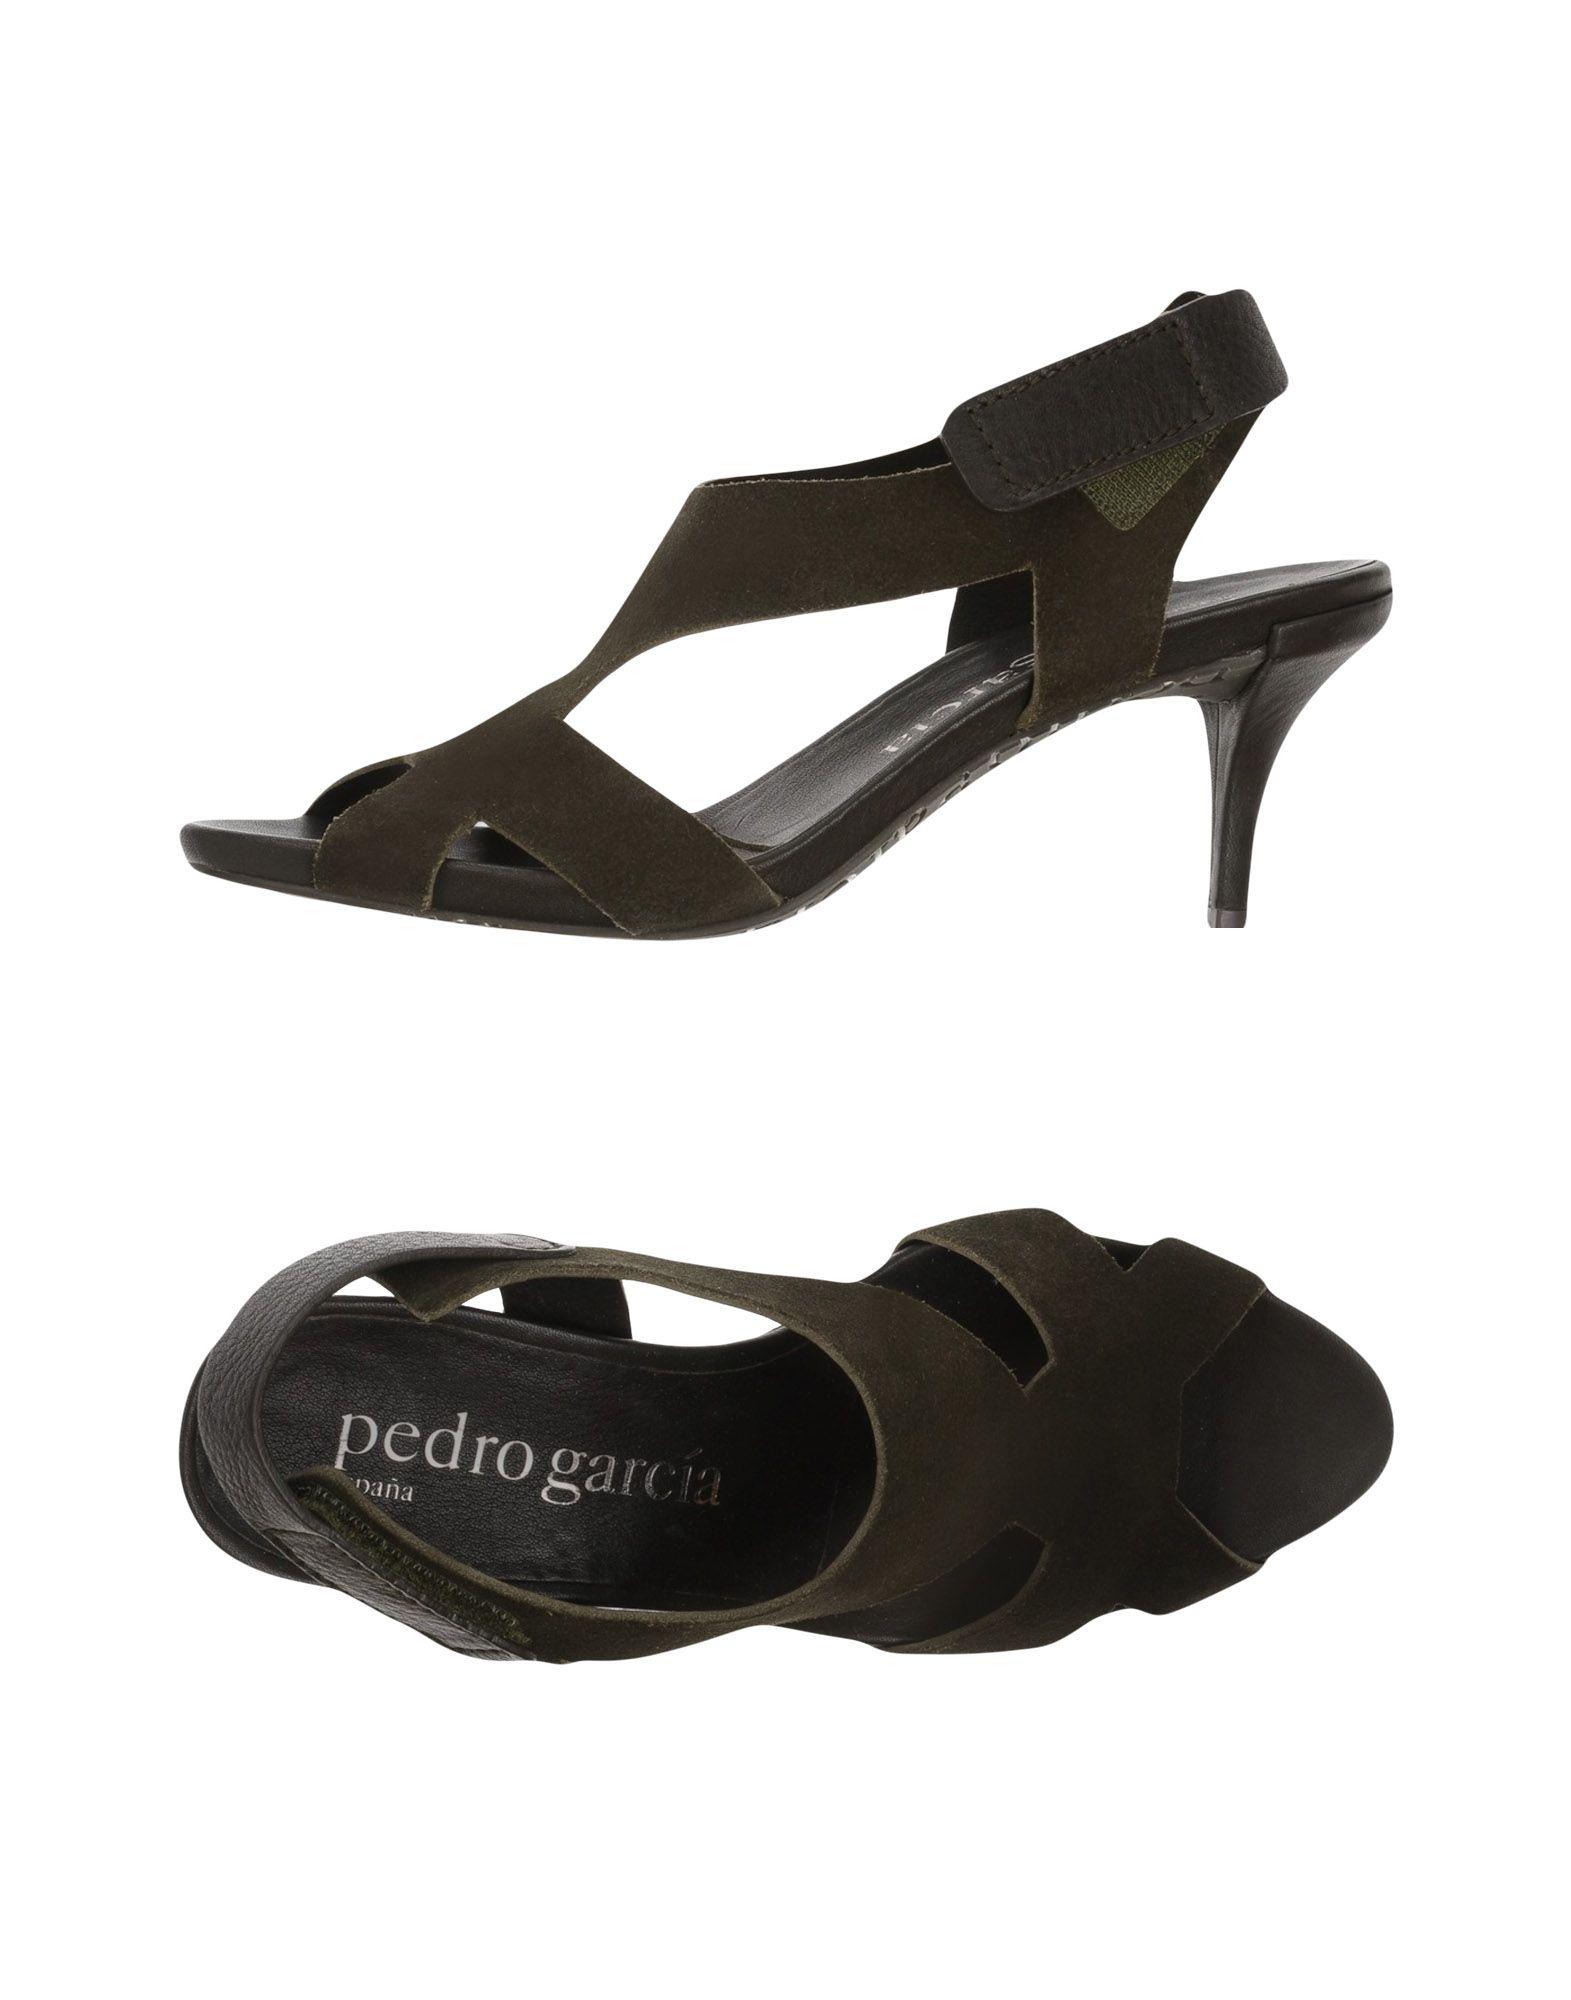 Pedro García Sandalen Damen  11364200II Gute Qualität beliebte Schuhe